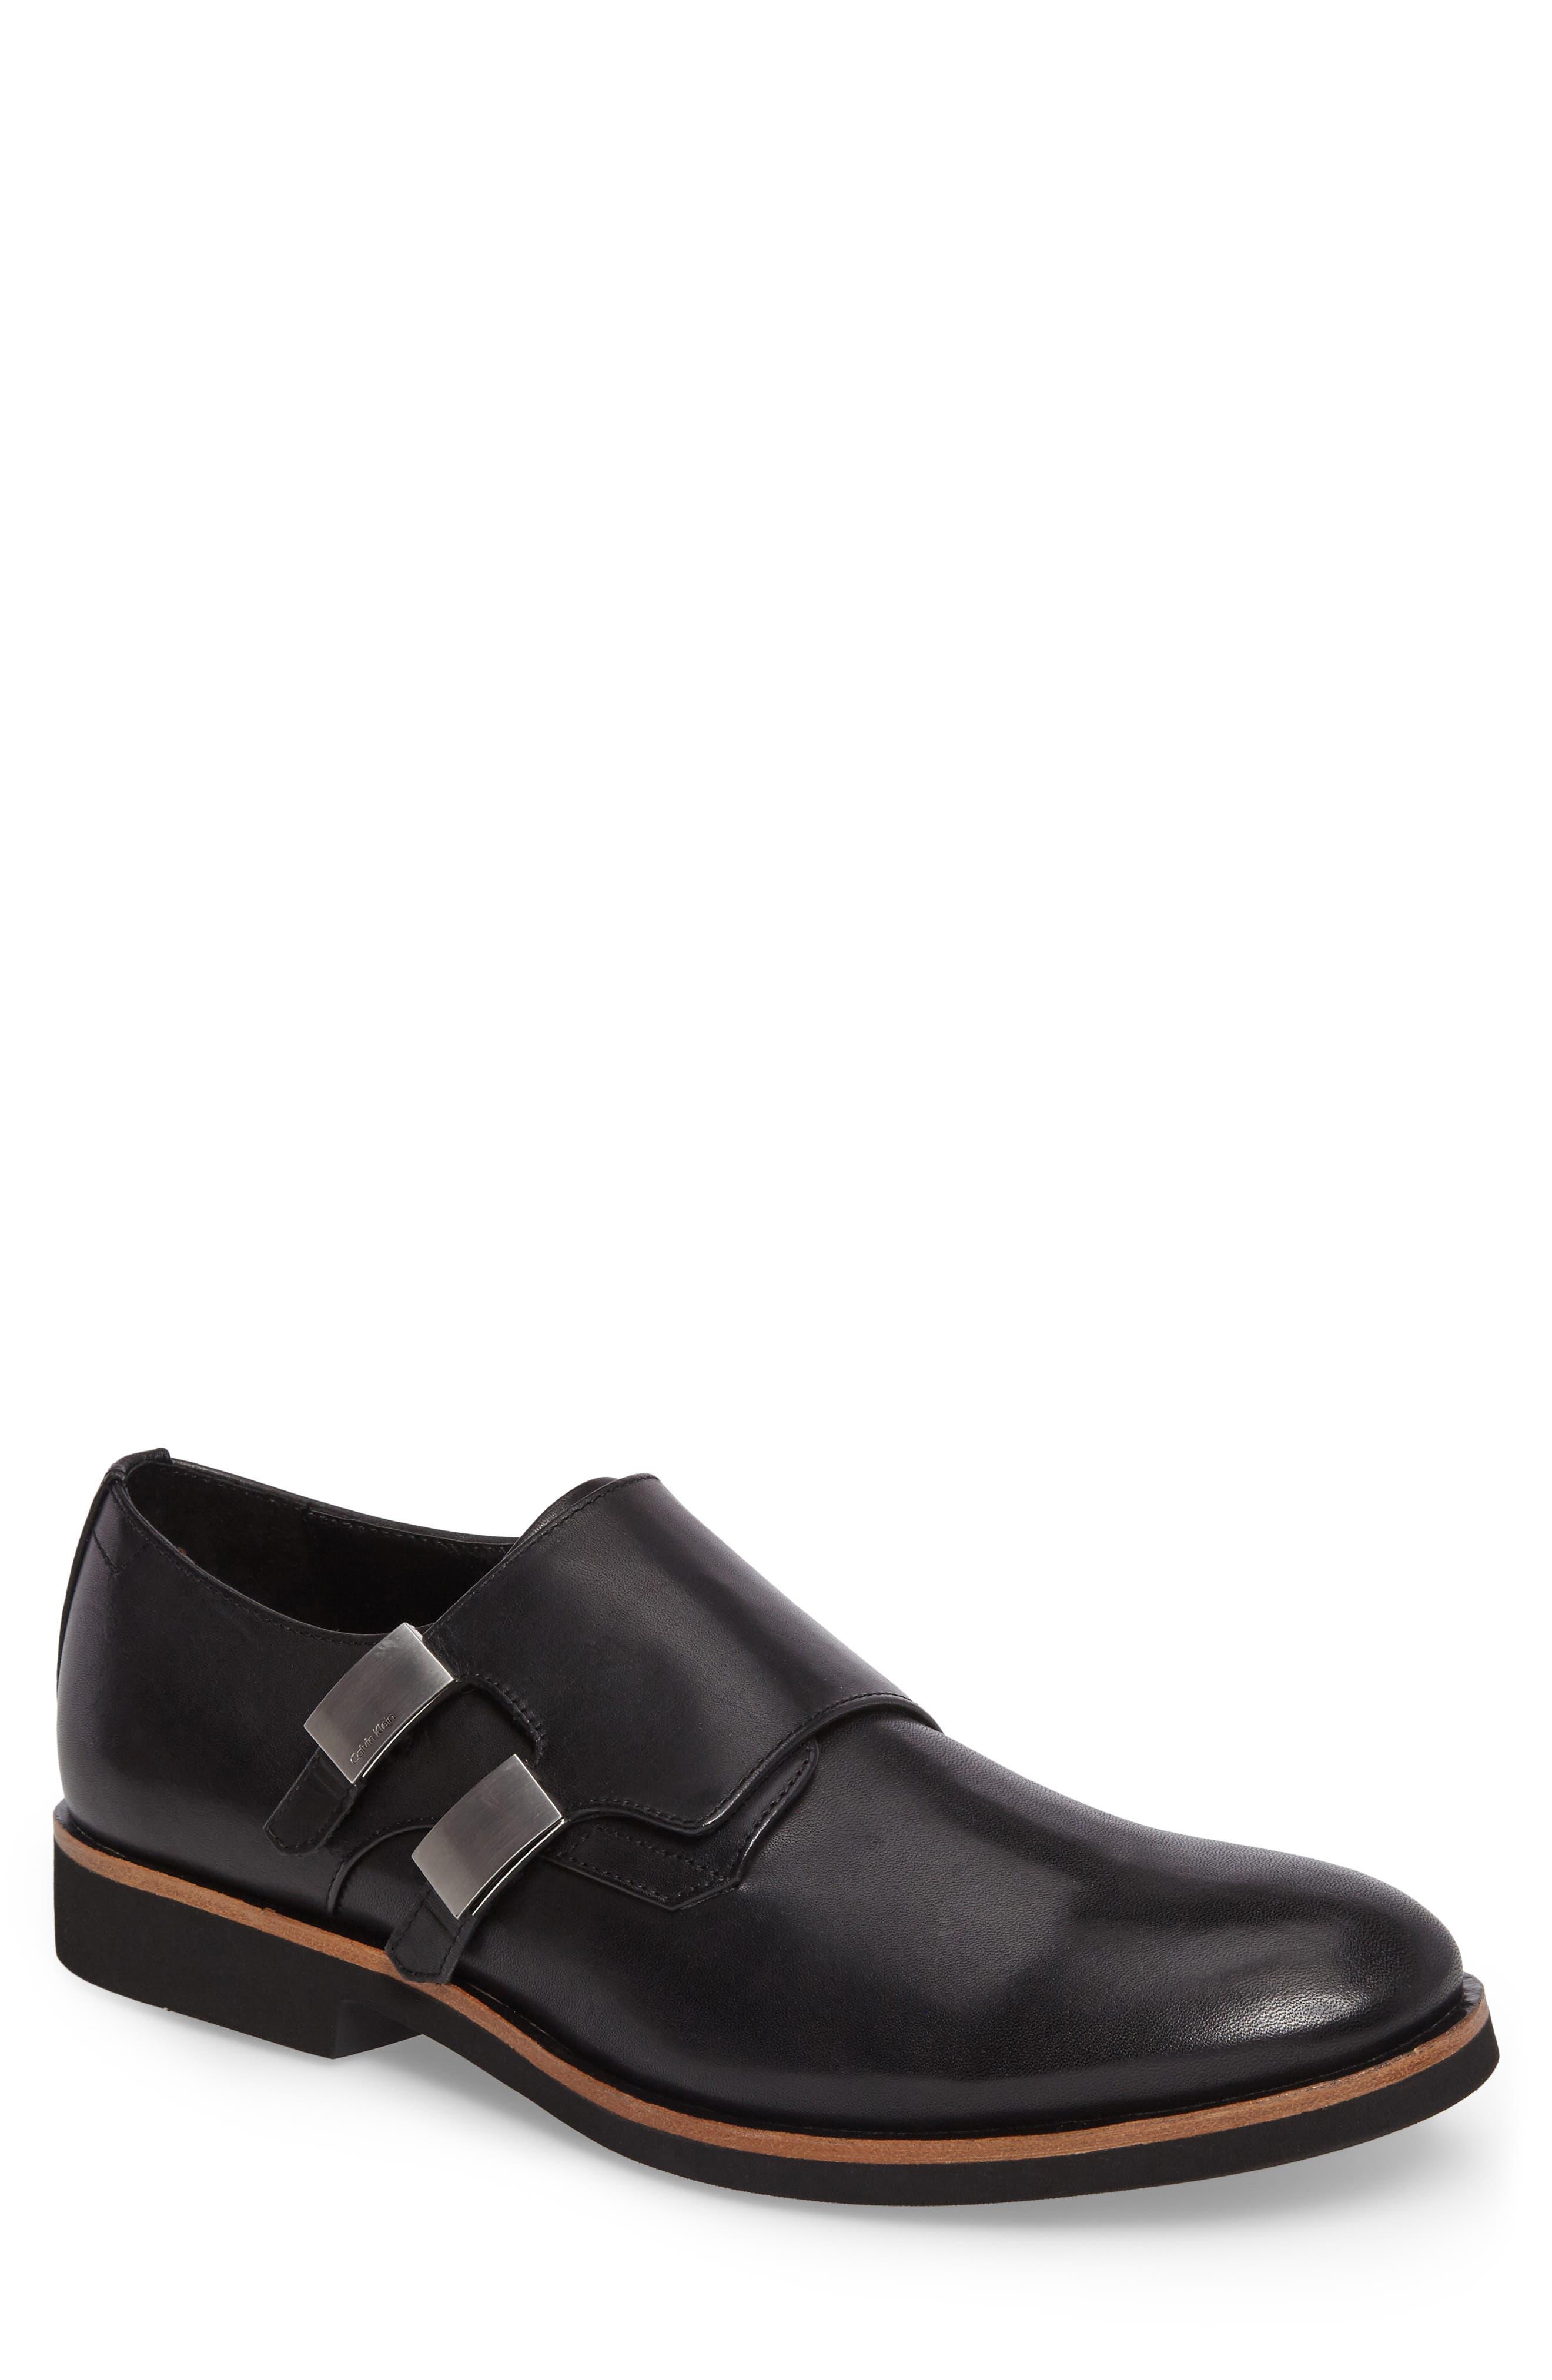 CALVIN KLEIN Finnegan Double Monk Strap Shoe